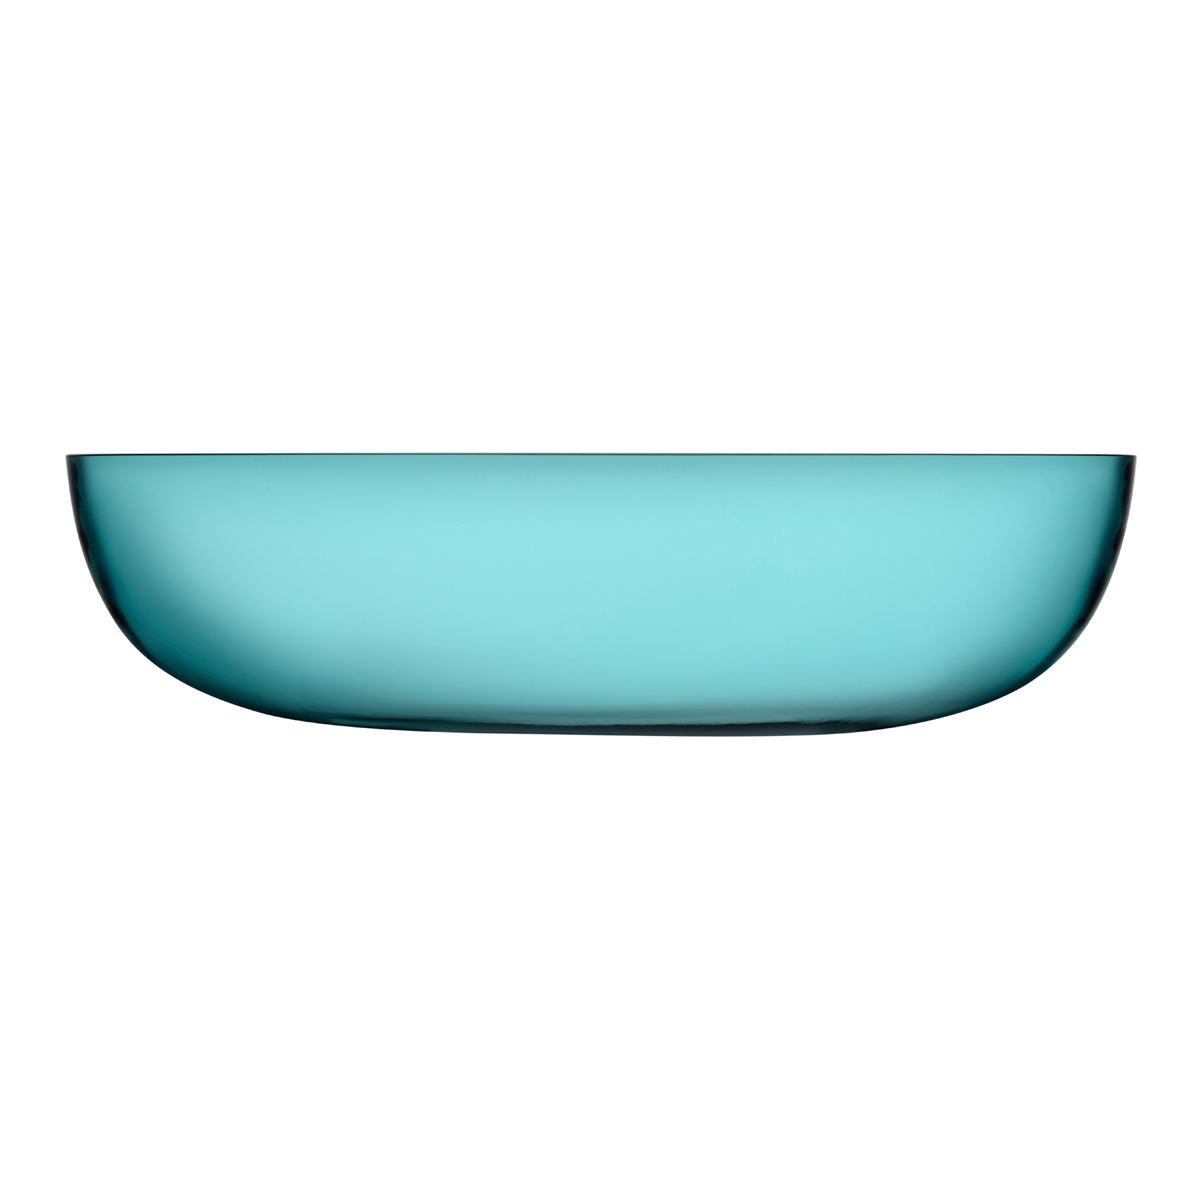 "Iittala Raami Serving Bowl 12"" Sea Blue"